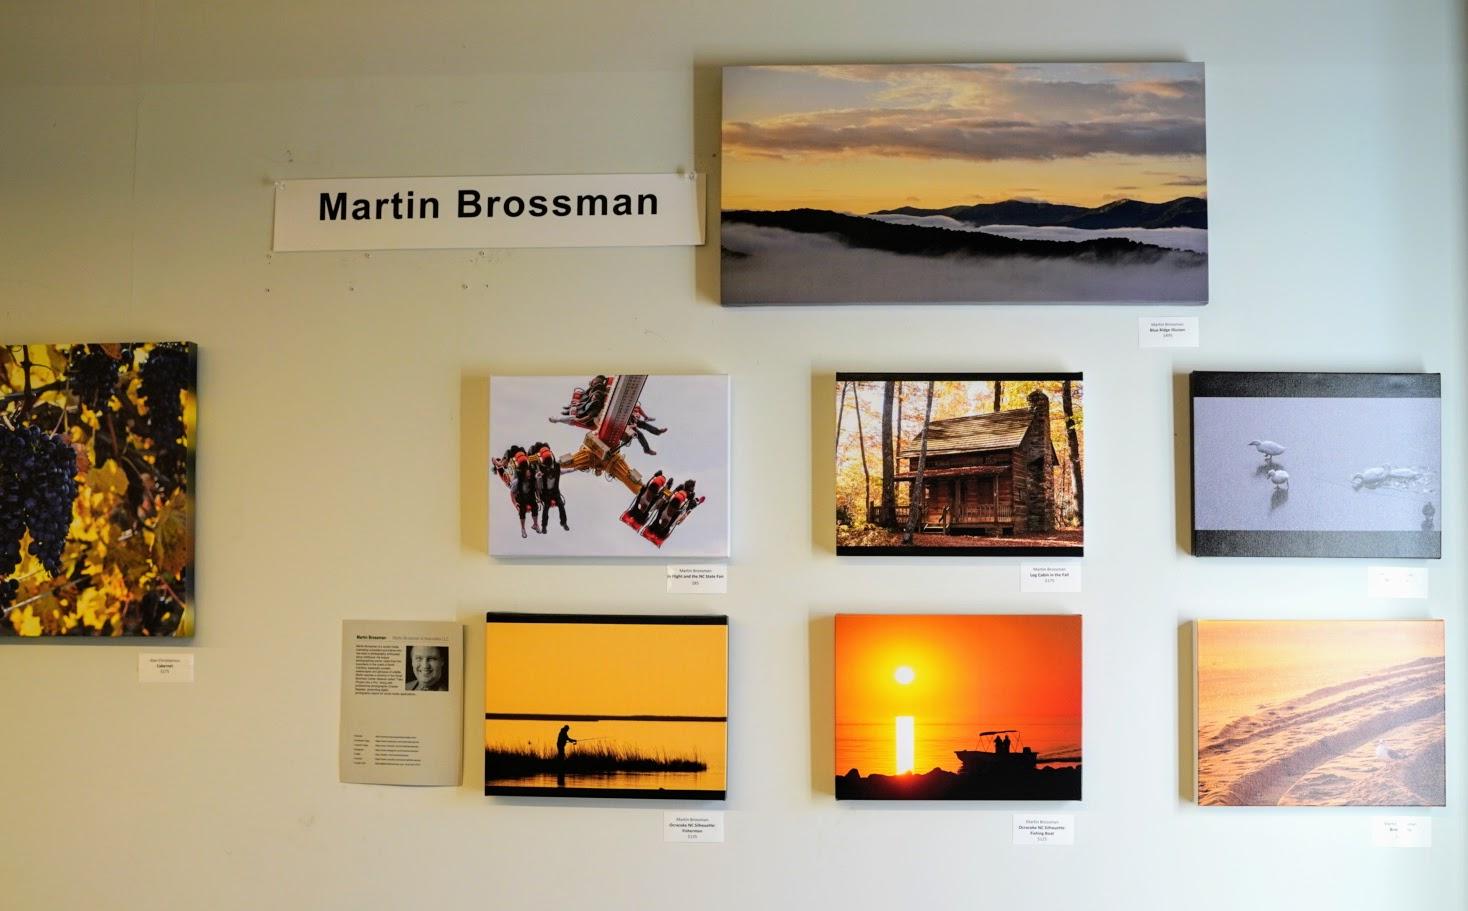 Martin Brossman's Photos at the Lobby Art Connect event